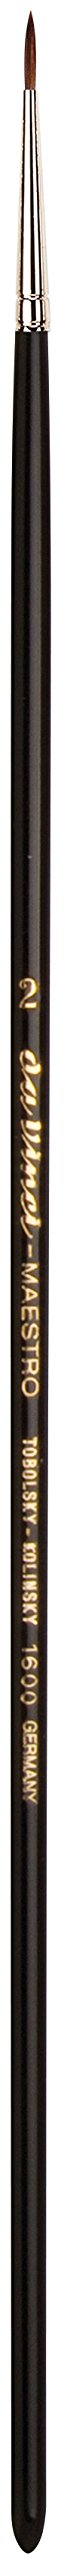 da Vinci Oil & Acrylic Series 1600 Maestro Oil Paint Brush, Round Kolinsky Red Sable, Size 2